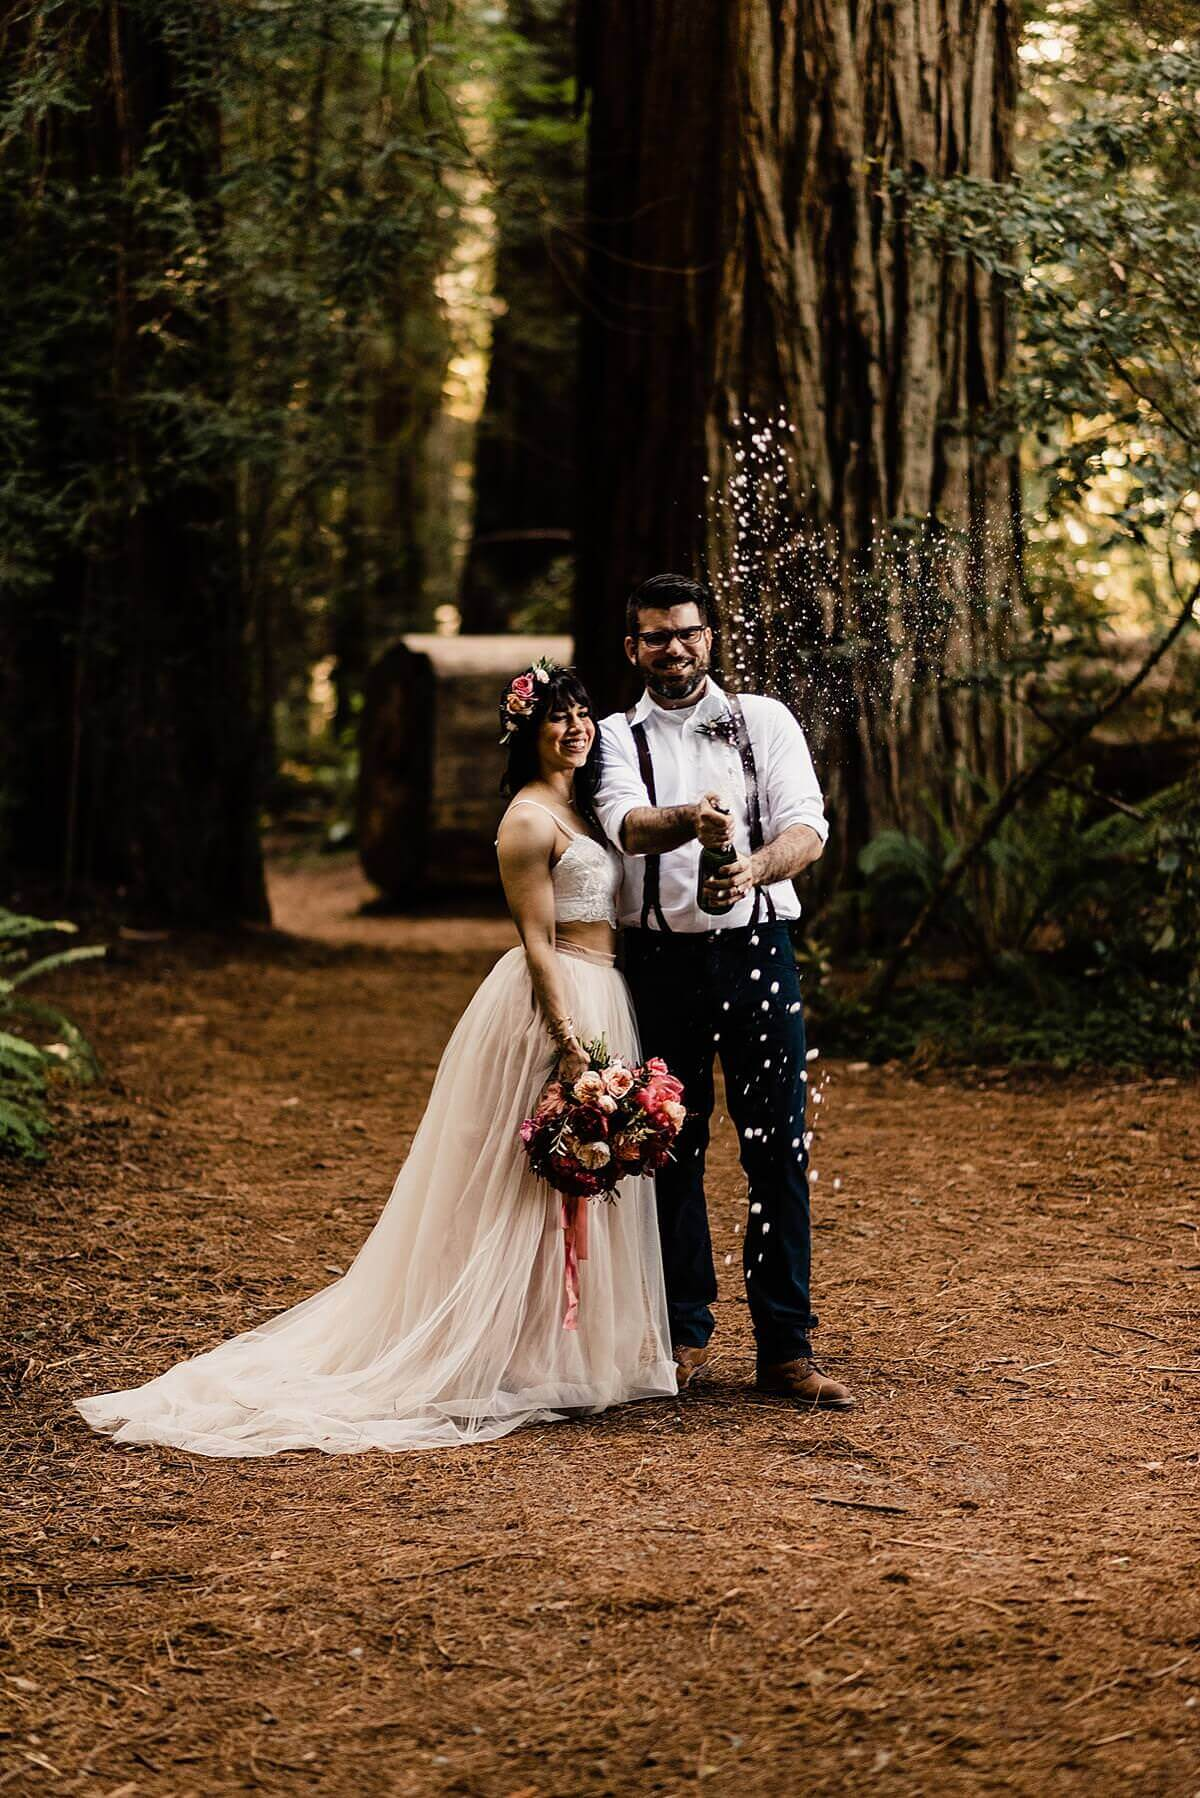 Allison-Brooks-Jedediah-Smiith-Redwoods-Adventure-Elopement-Wedding-S-Photography-Blog_0042.jpg